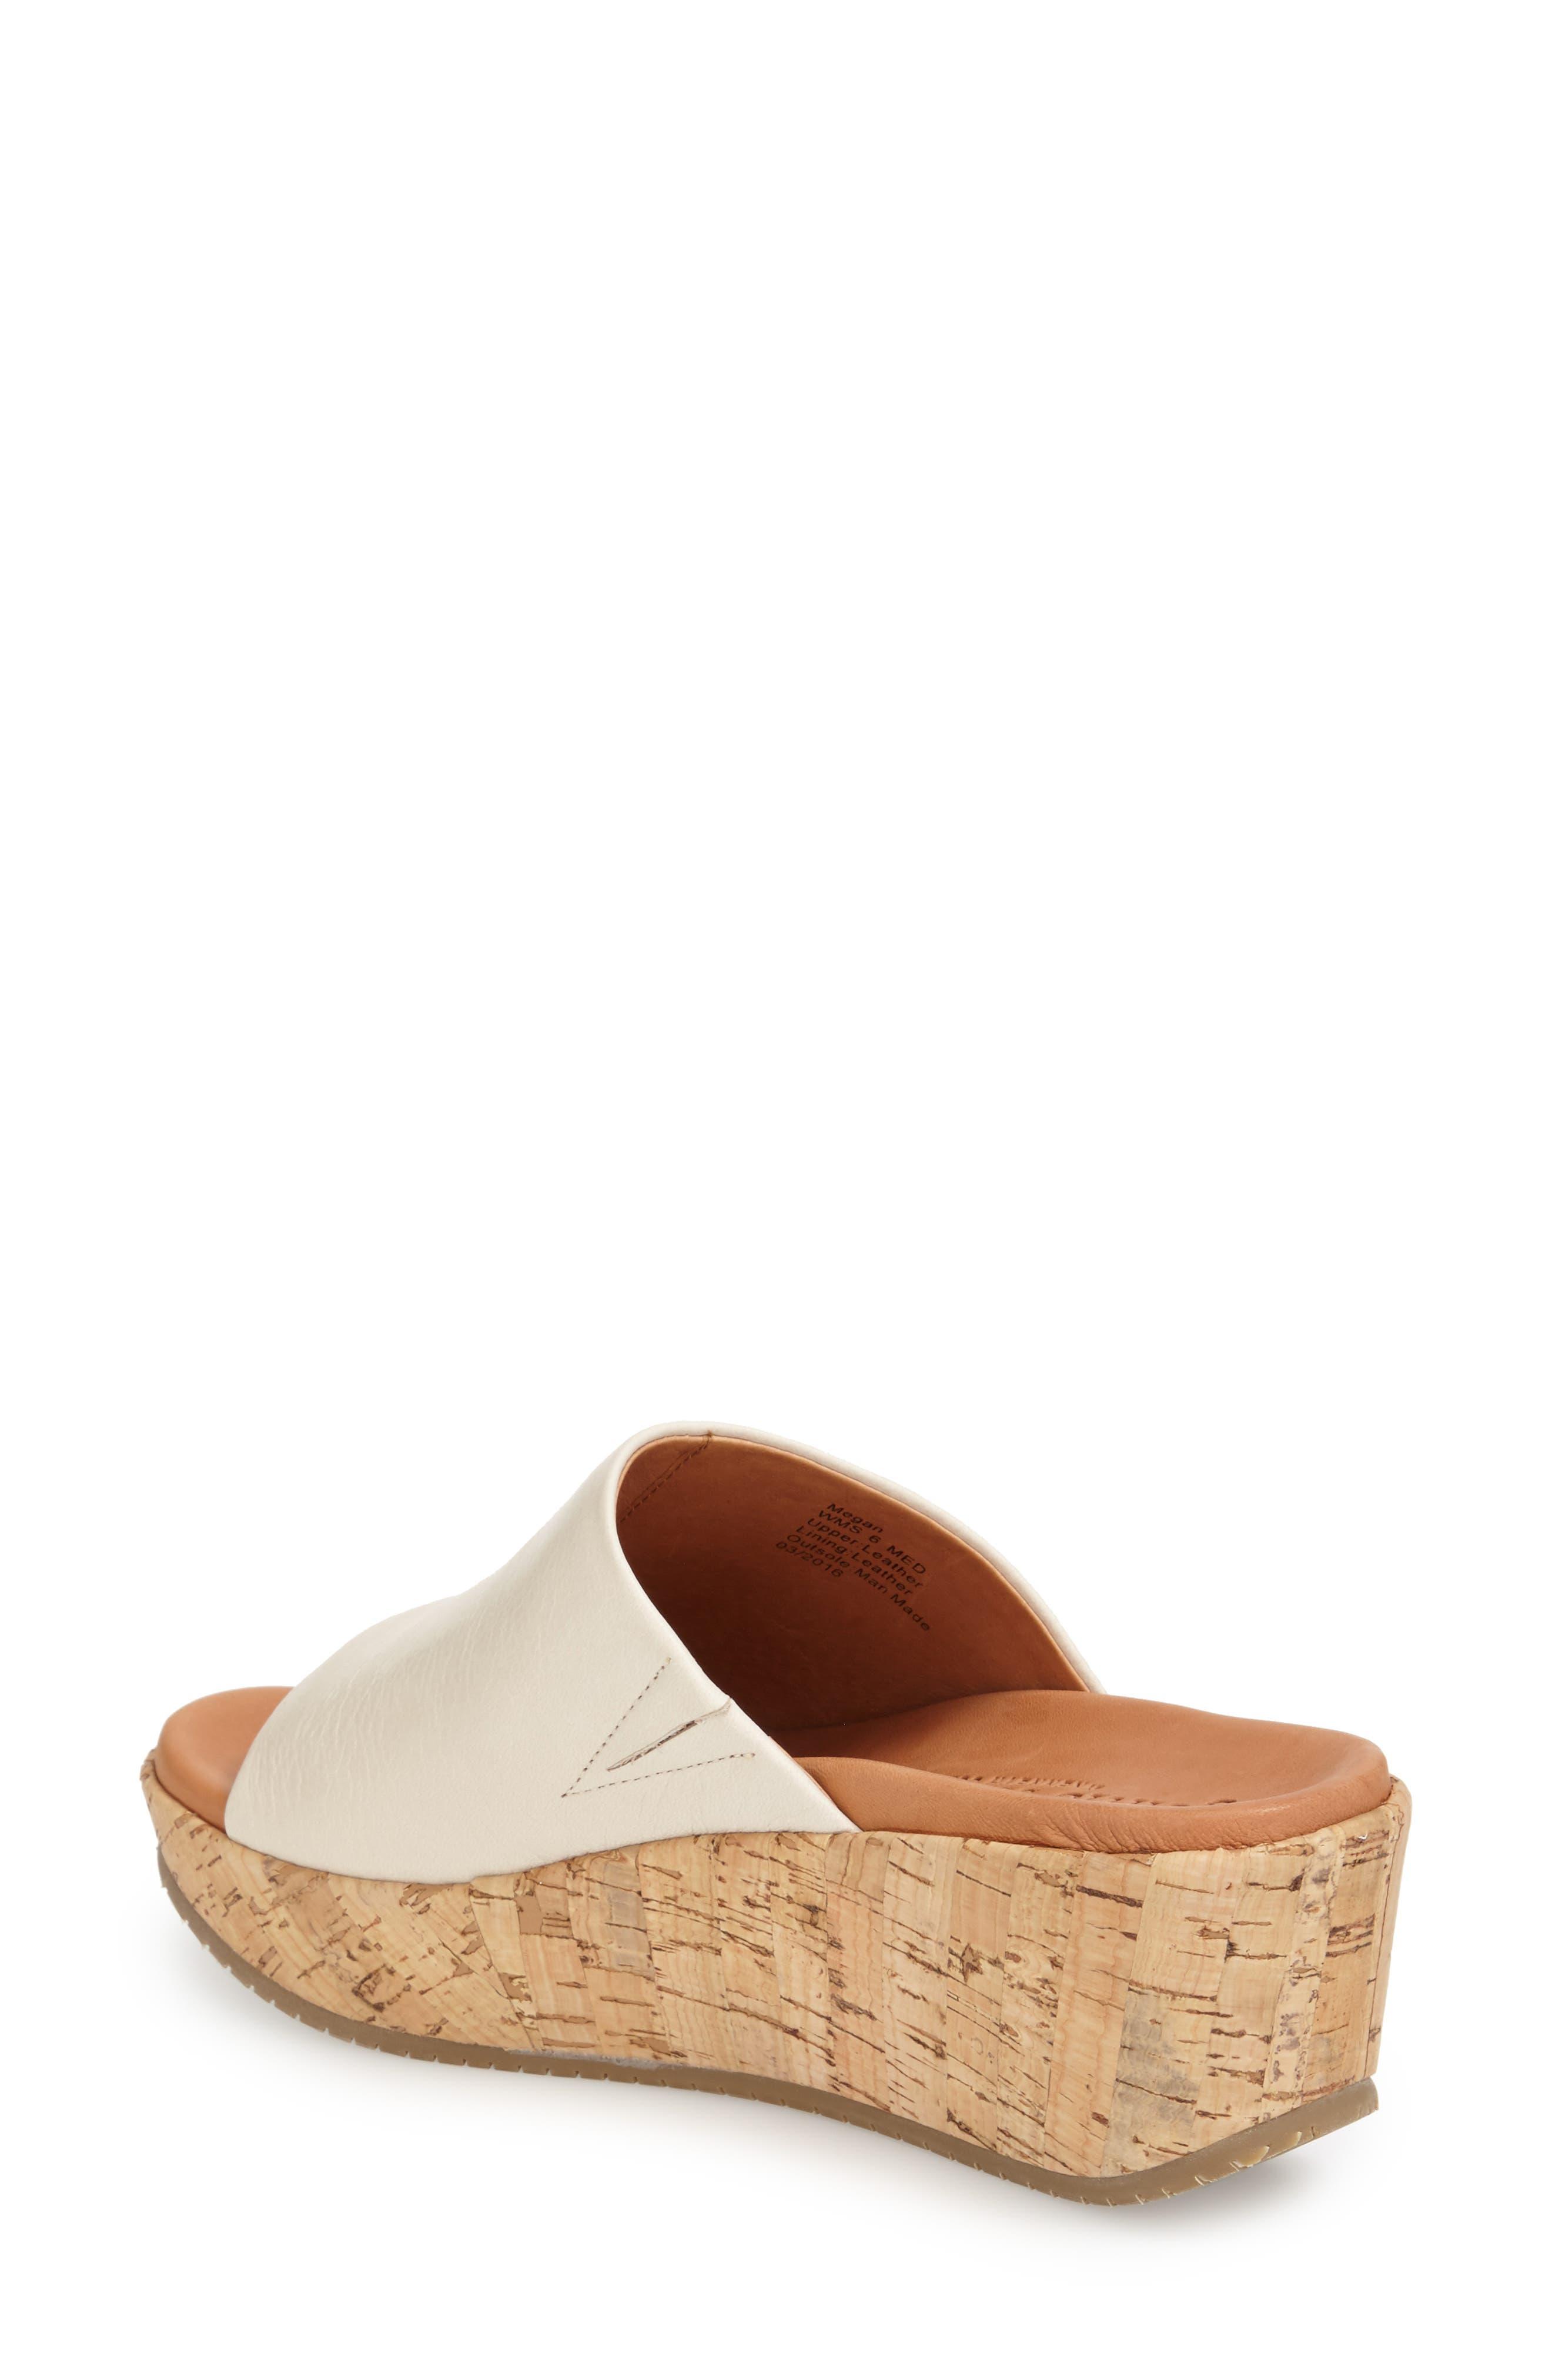 'Megan' Platform Wedge Sandal,                             Alternate thumbnail 3, color,                             053